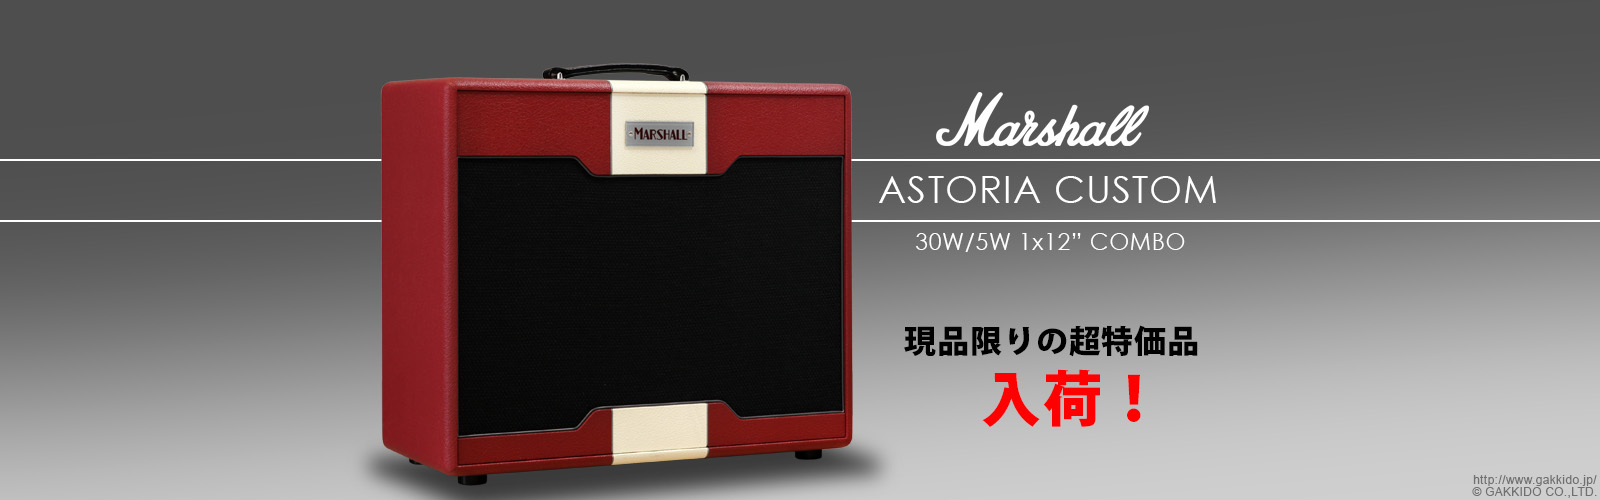 Marshall AST2C ASTORIA CUSTOM COMBO ギターアンプ コンボ [特価品]